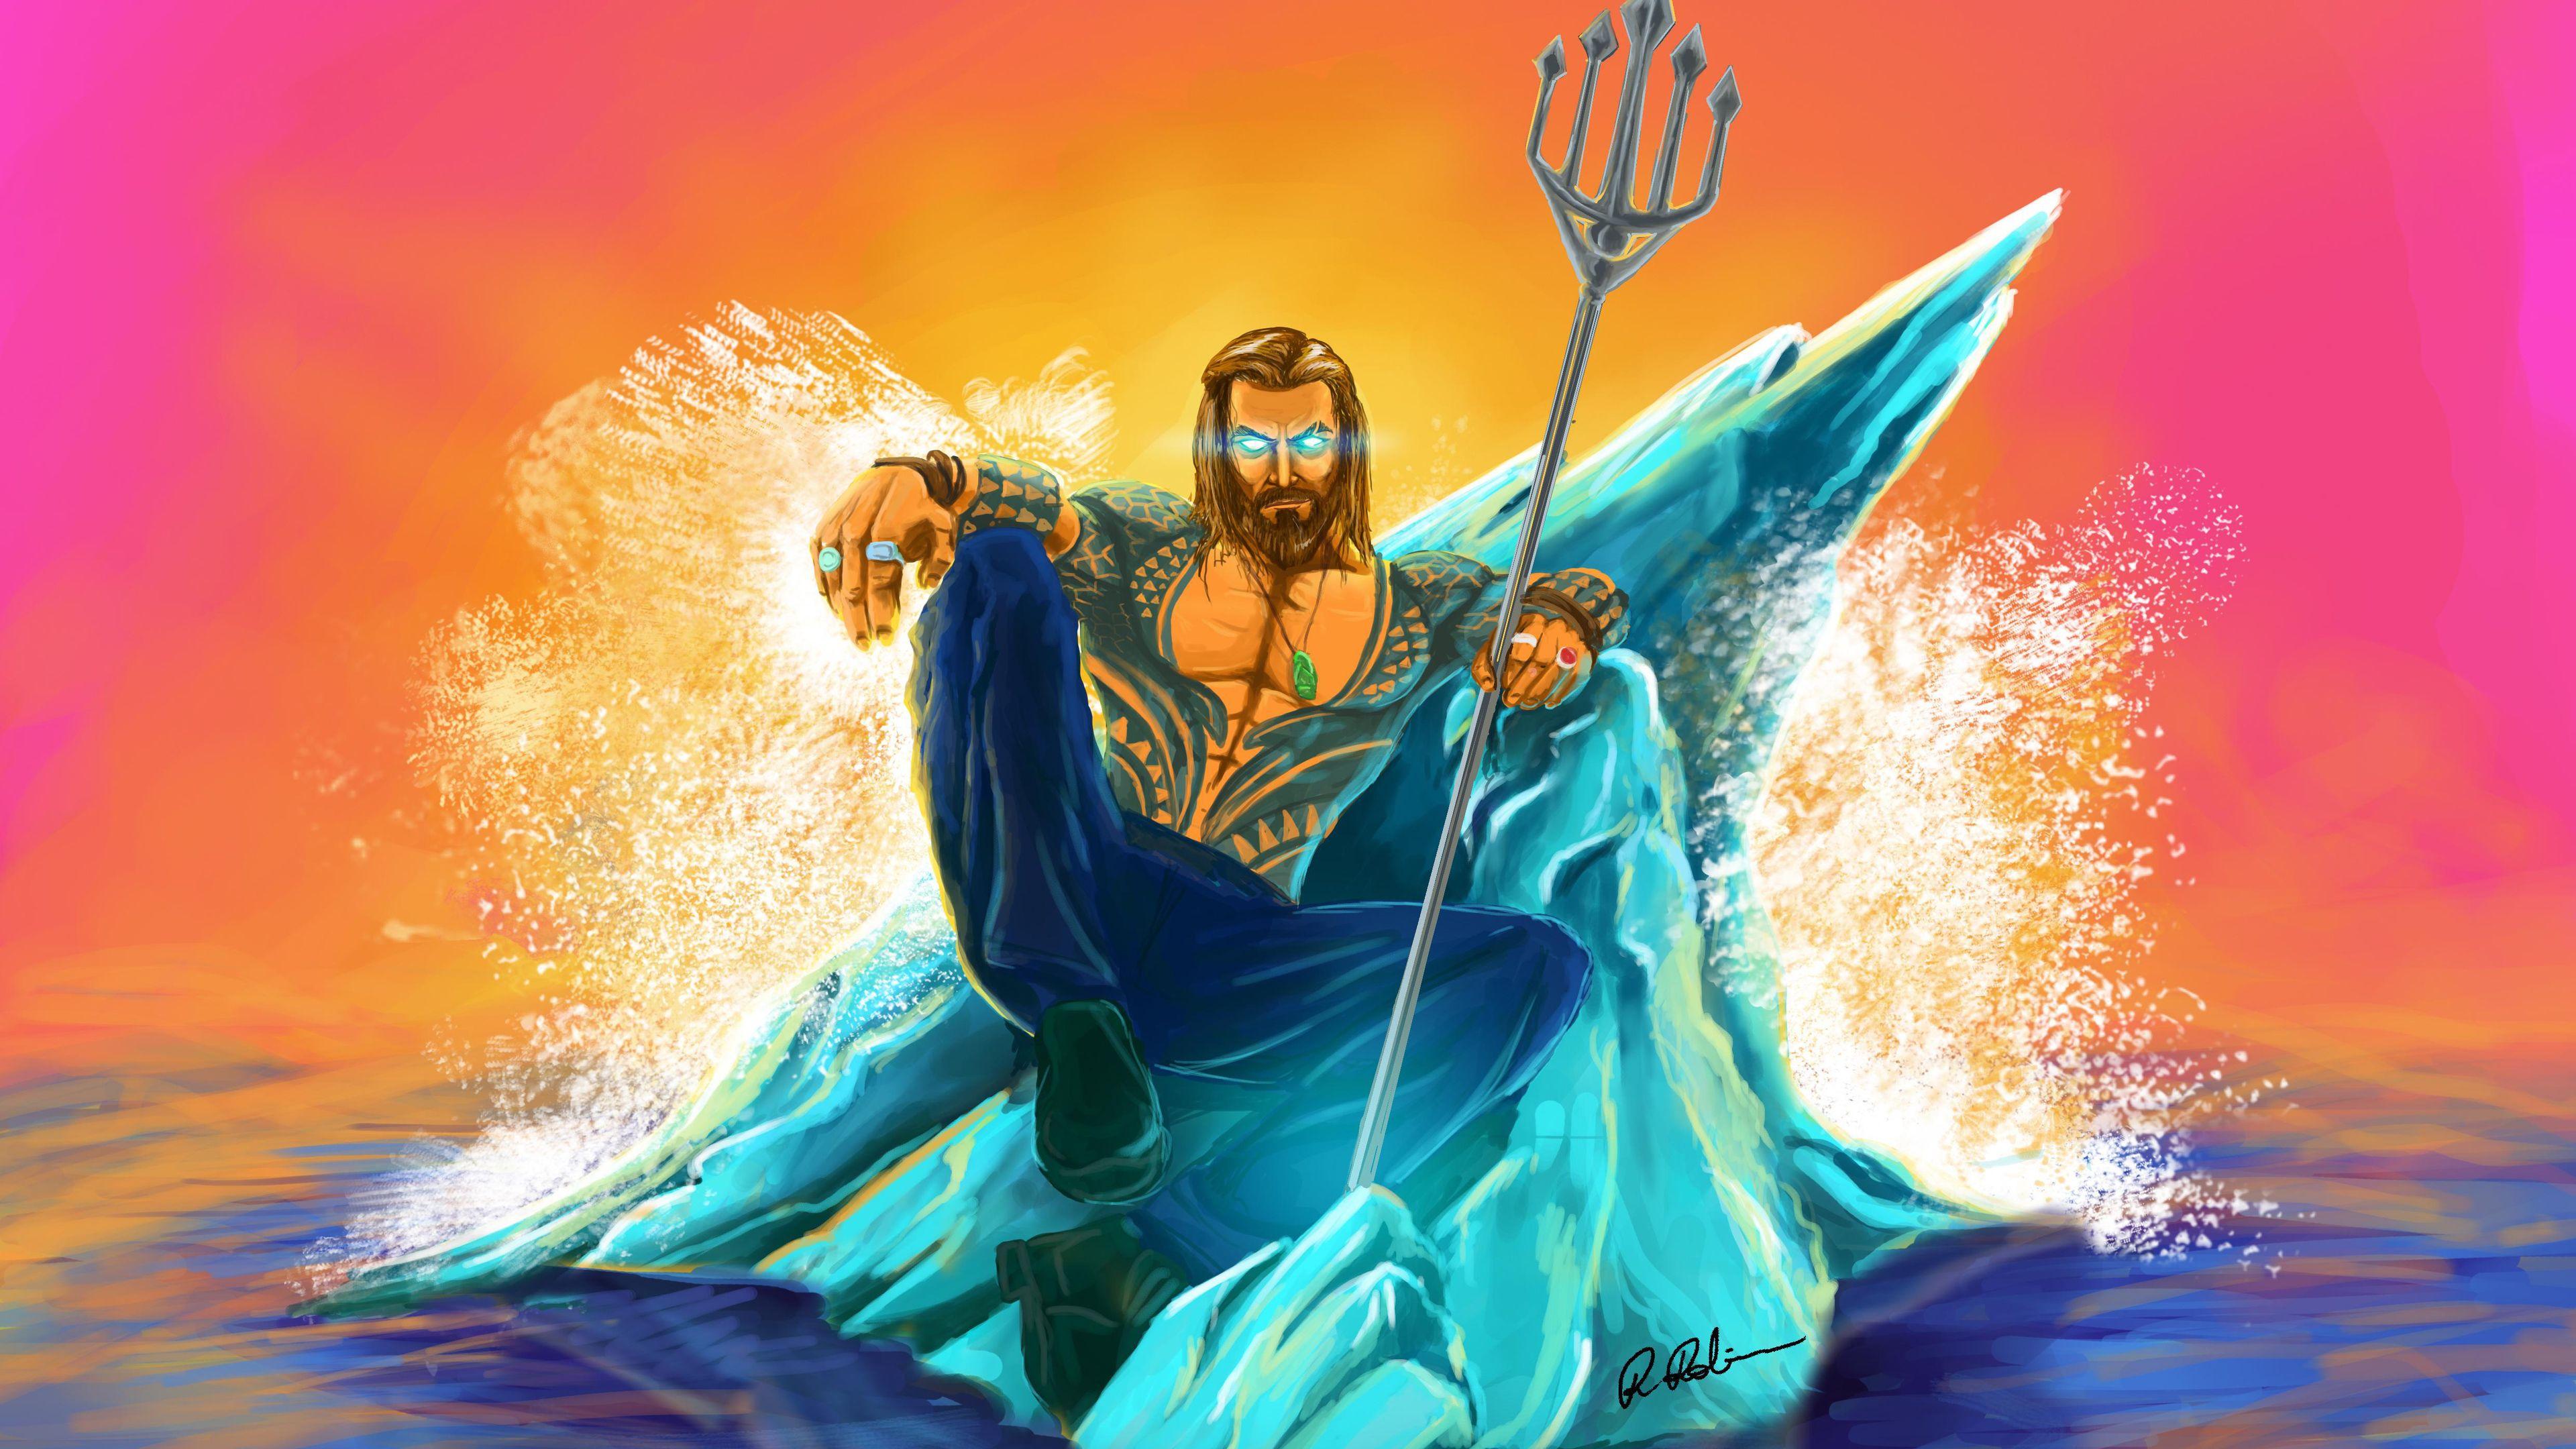 Aquaman Arts 4k Superheroes Wallpapers Hd Wallpapers